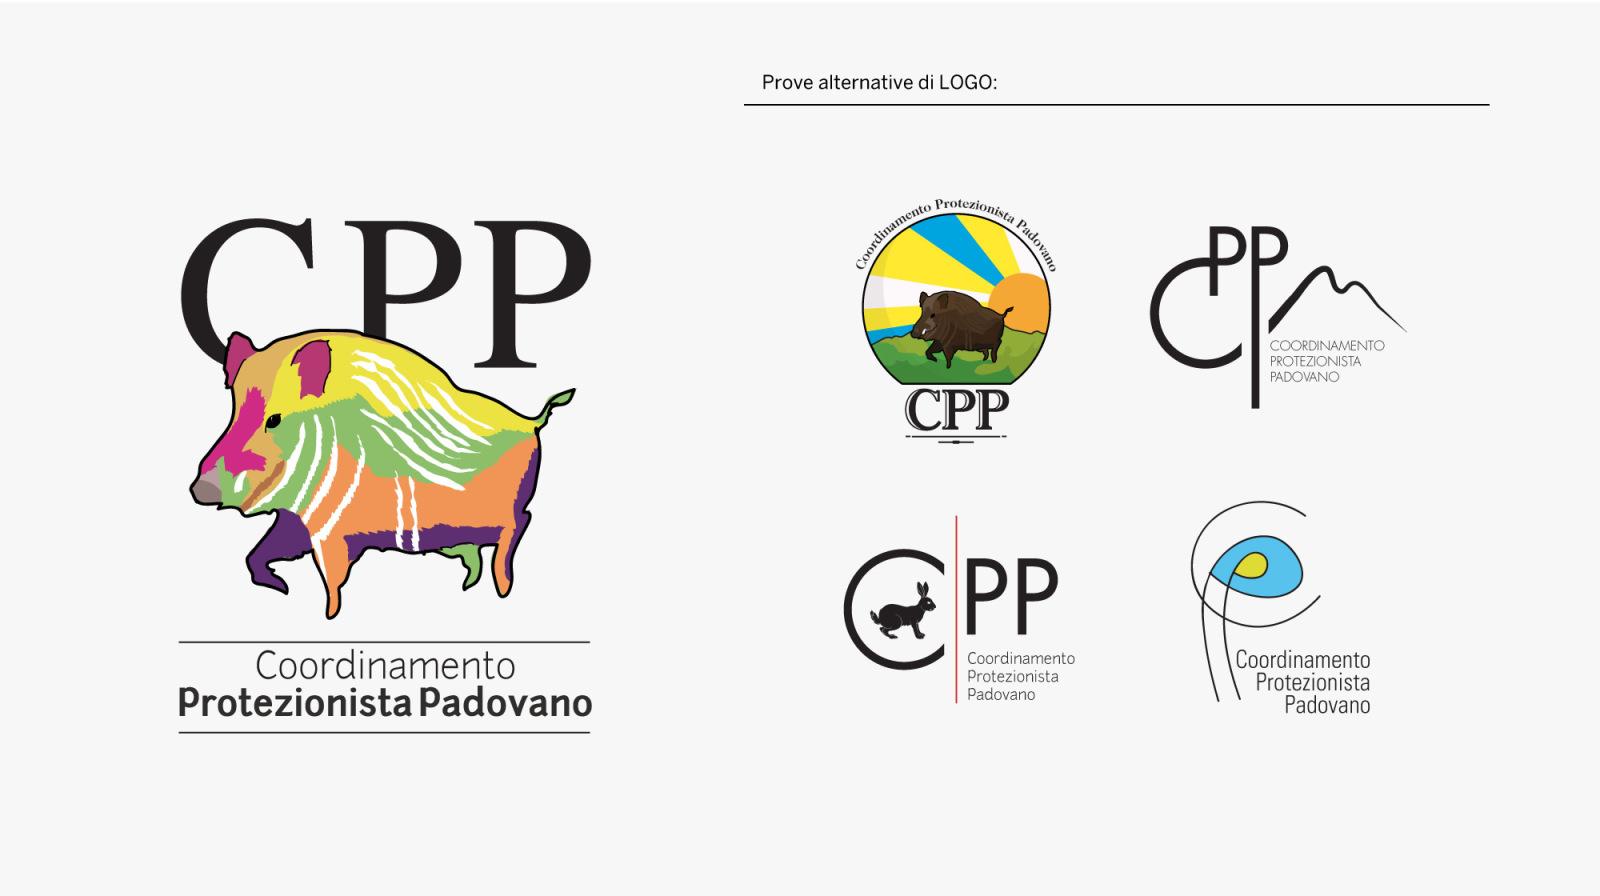 CPP_HolicLab_immagine_coordinata_3